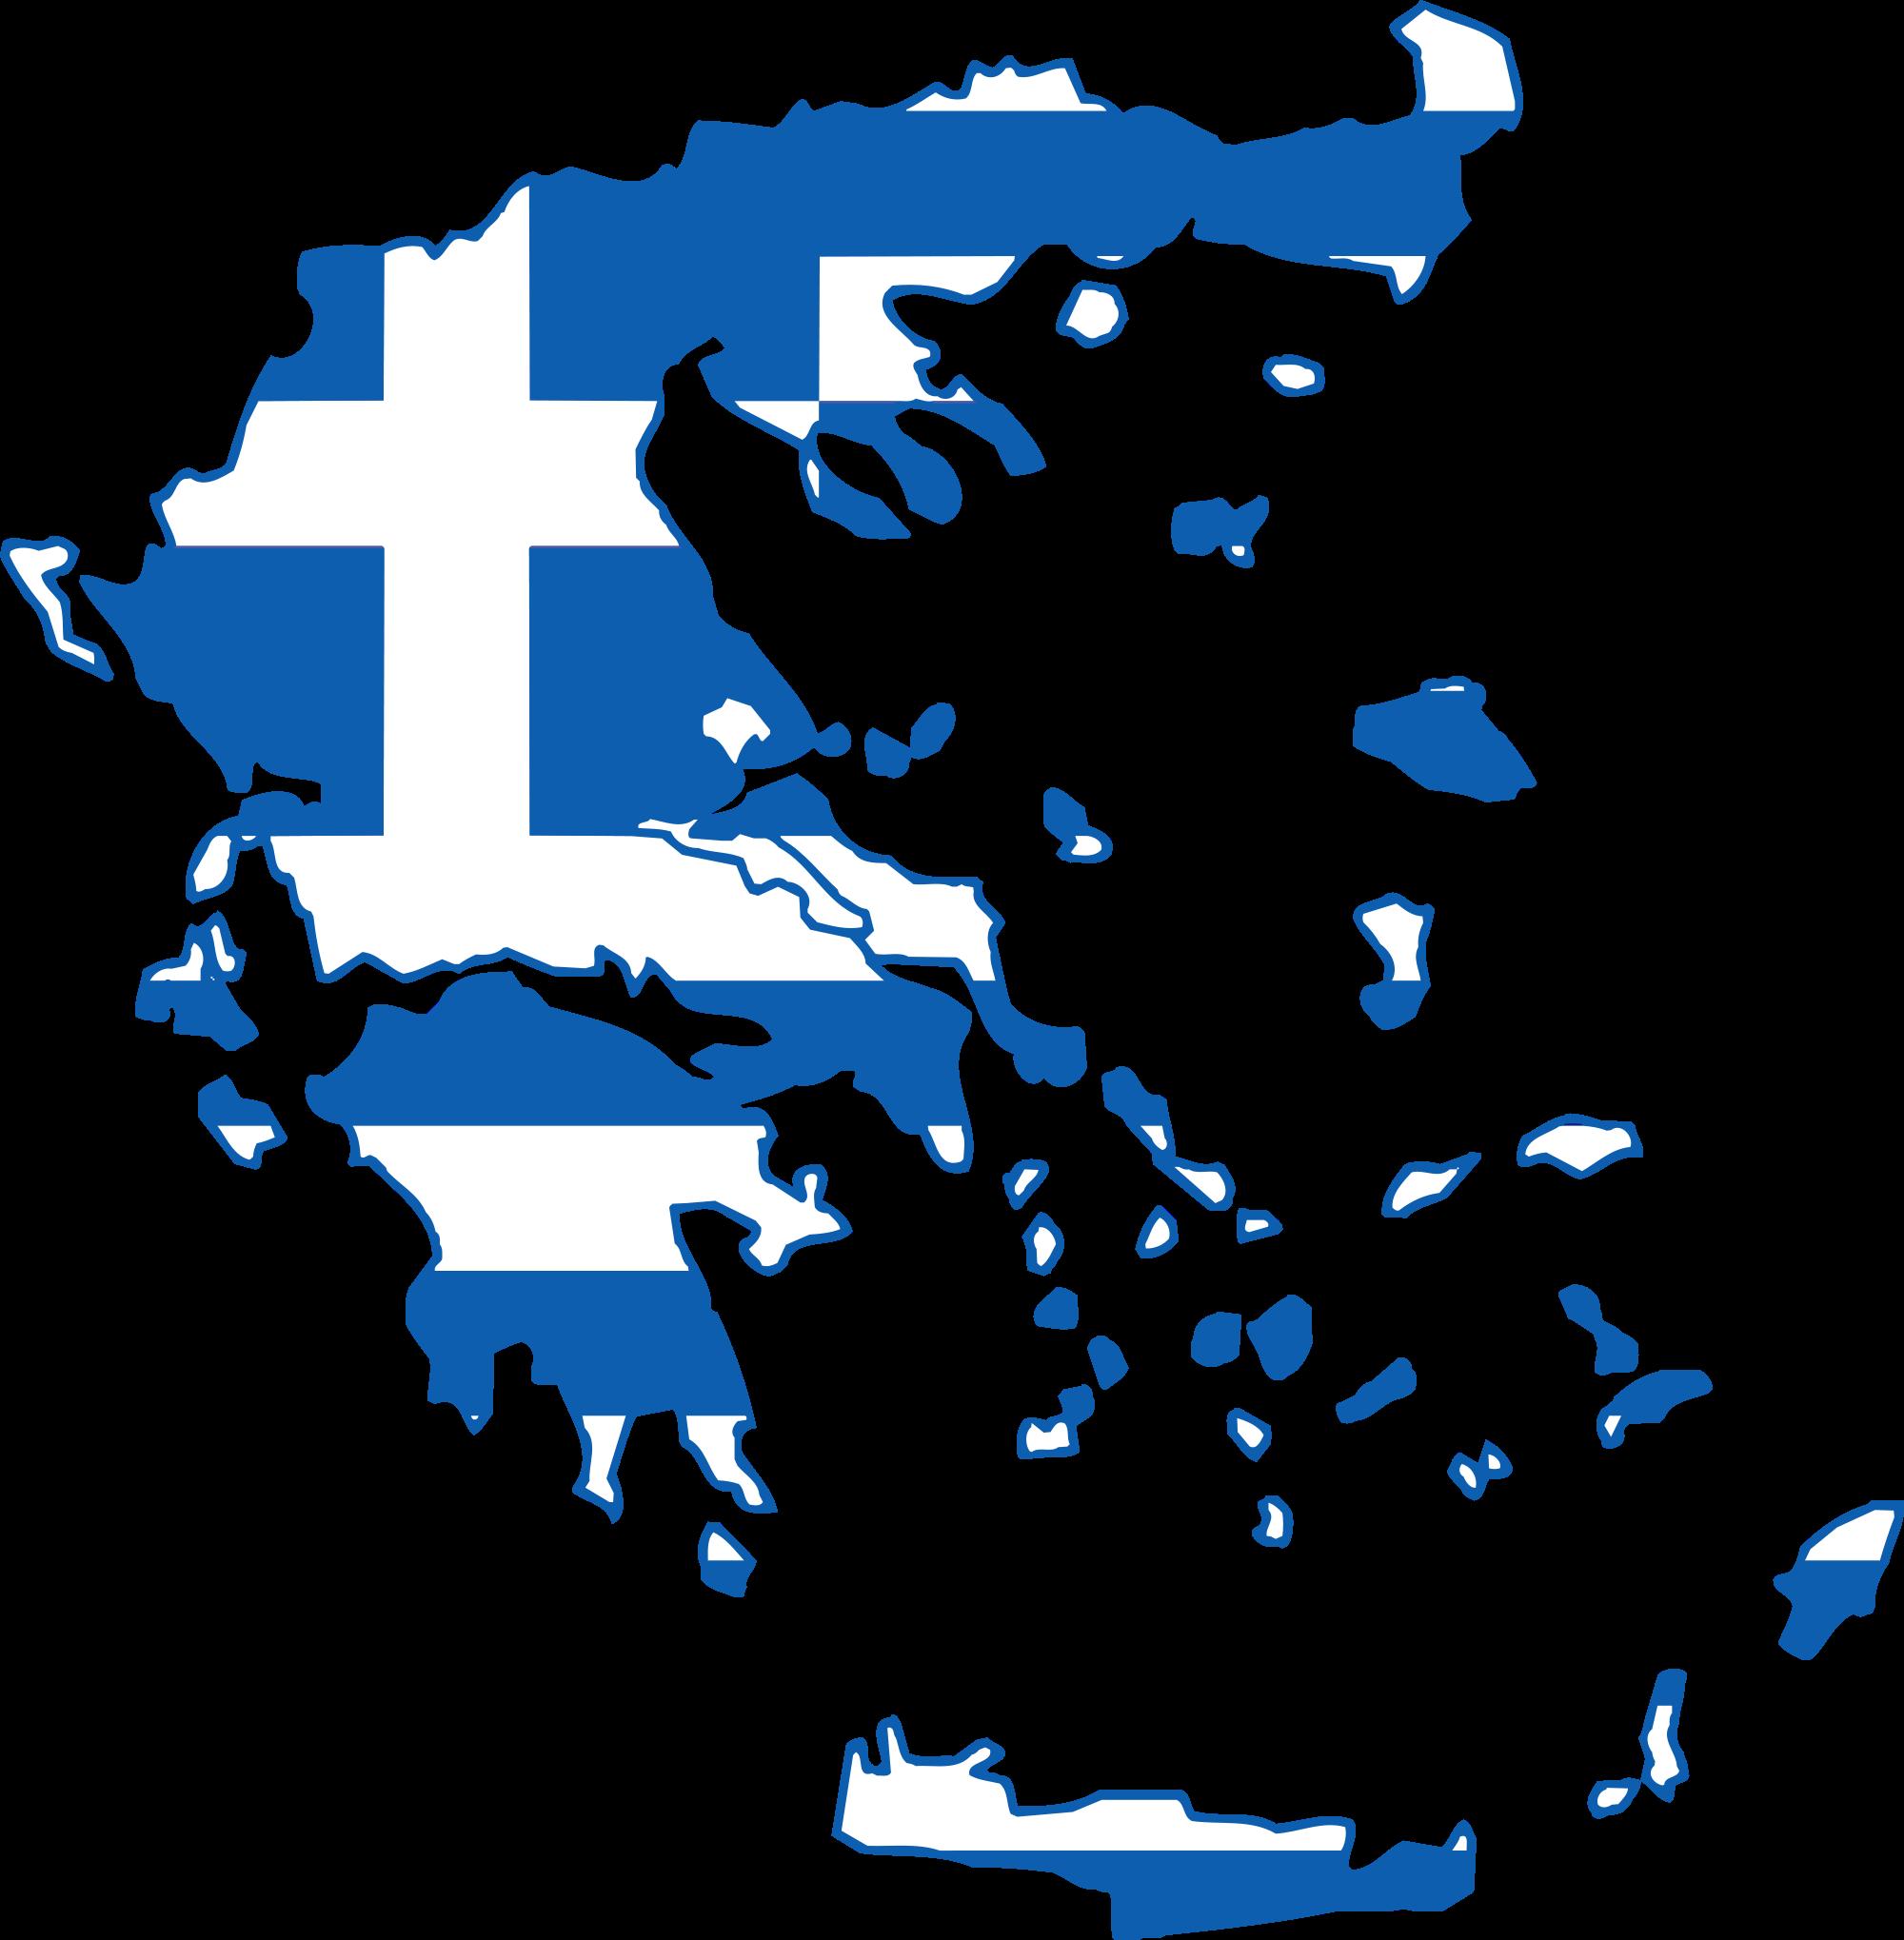 Axfone Řecko